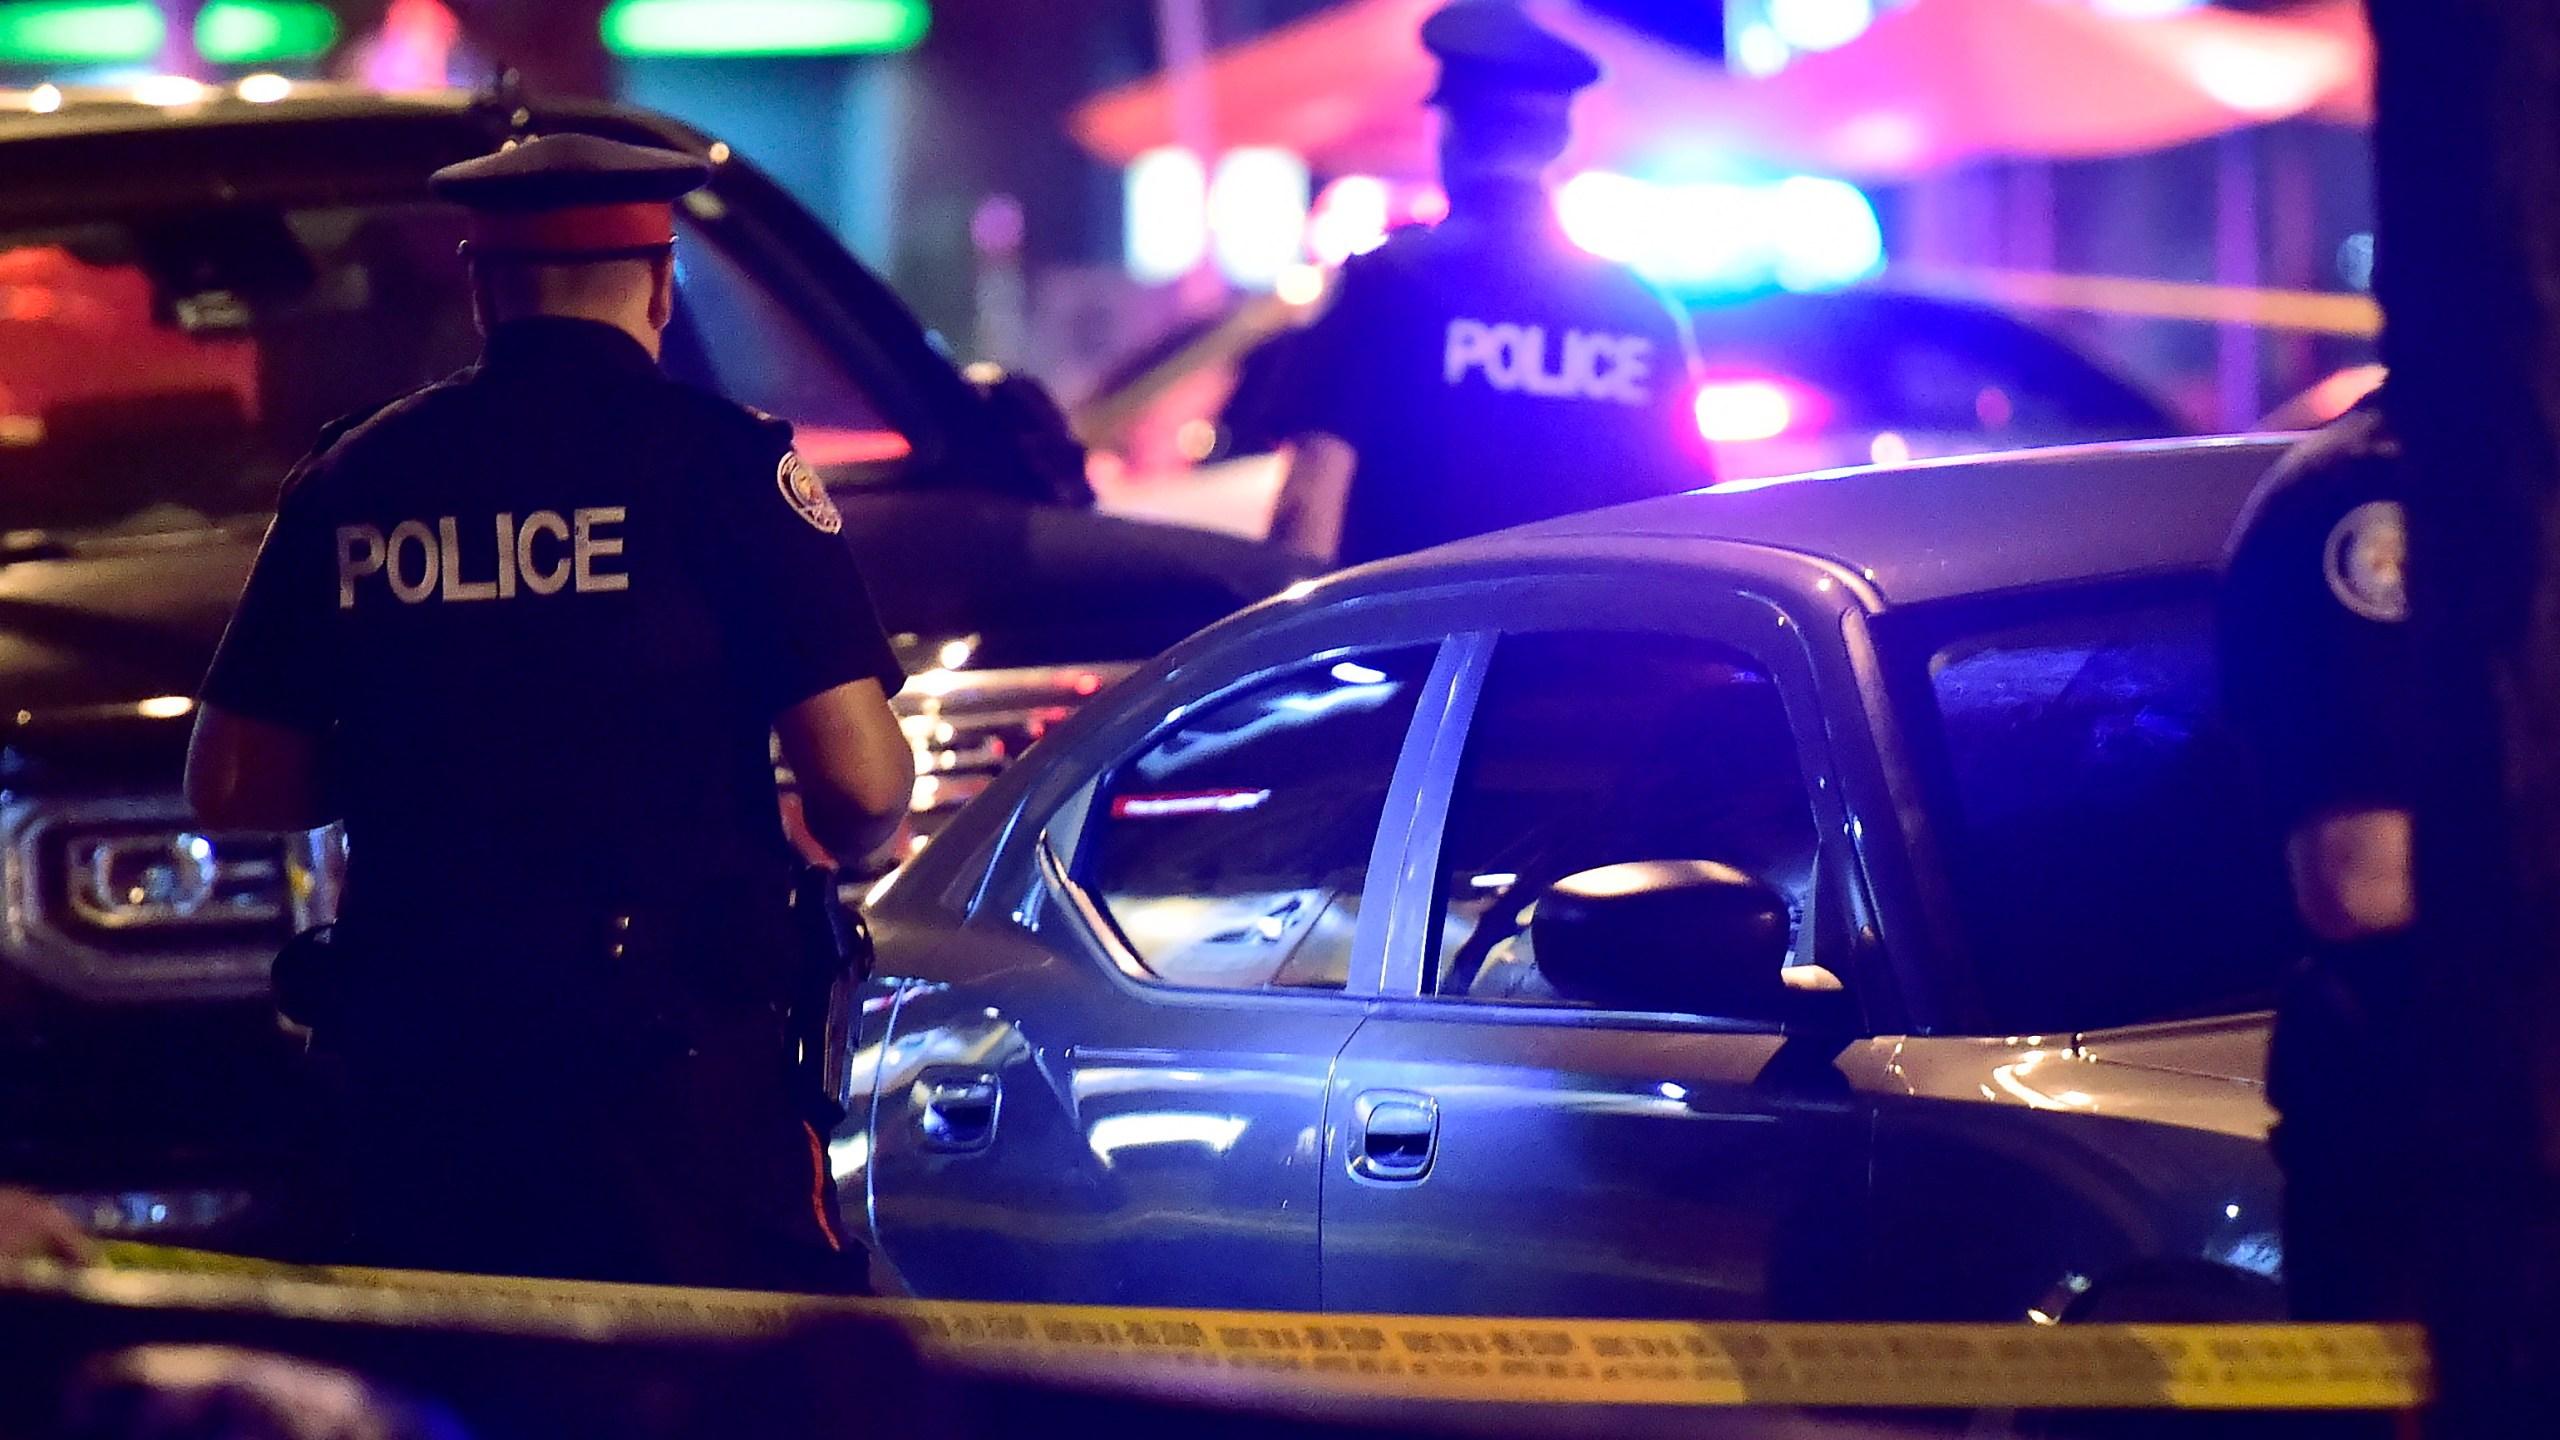 Canada_Toronto_Shooting_22618-159532.jpg59221972